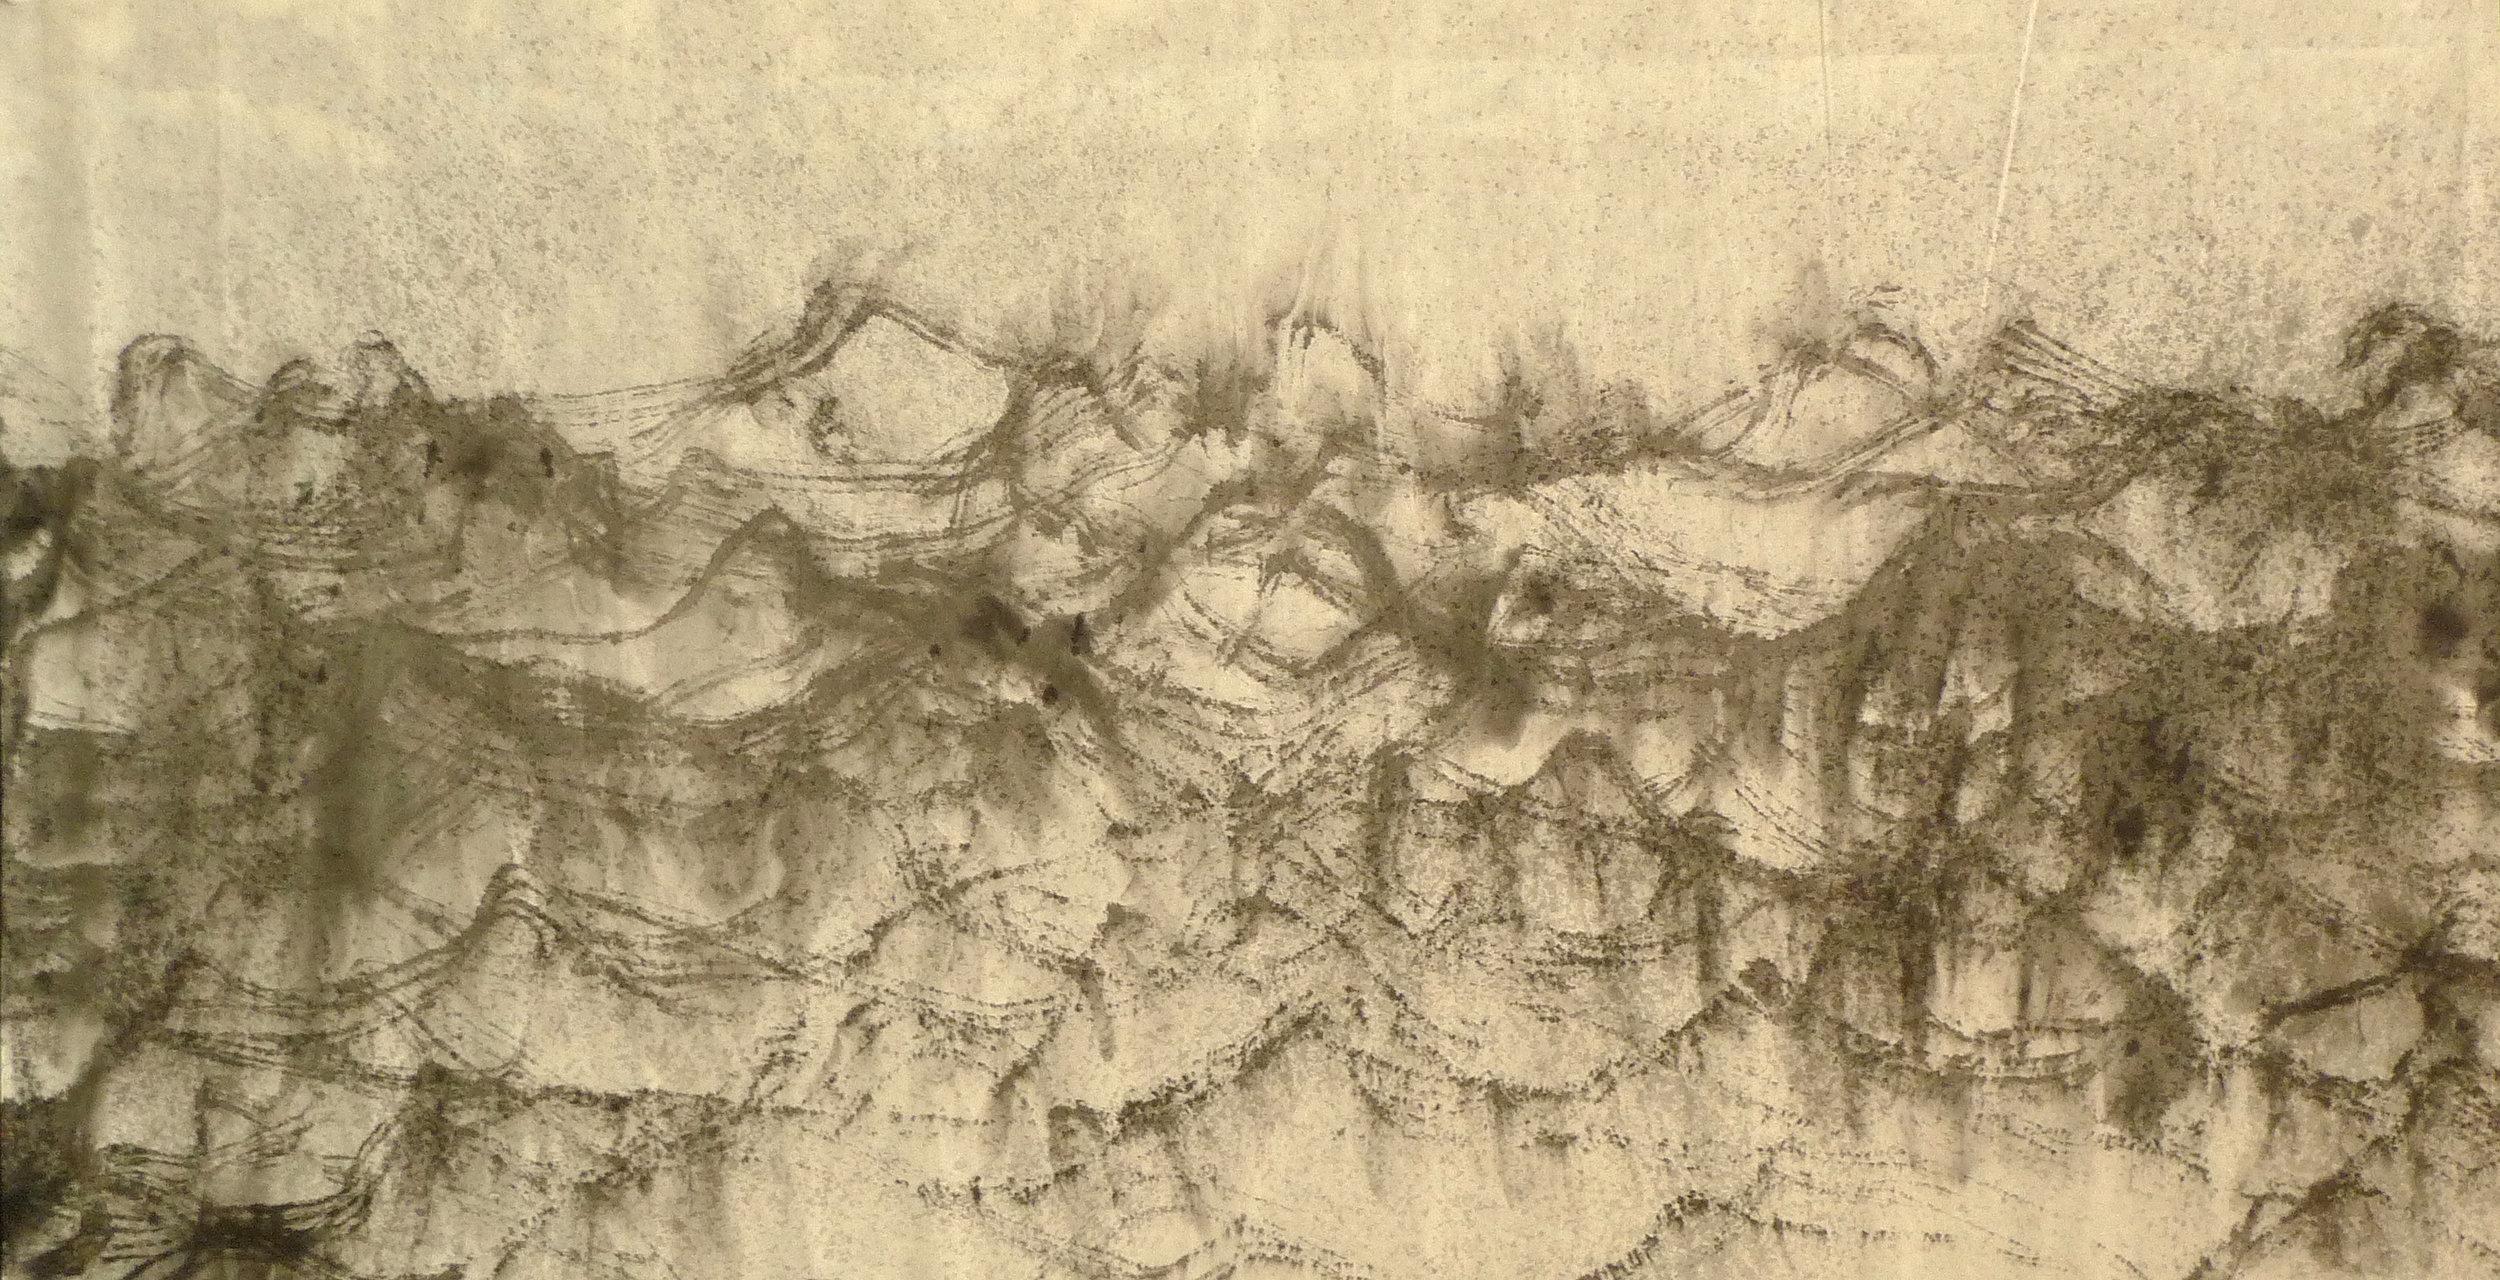 Zhou Jianjun 周建军, Untitled 无题, 2014, Ink on paper 纸本水墨设色, 95 x 176 cm